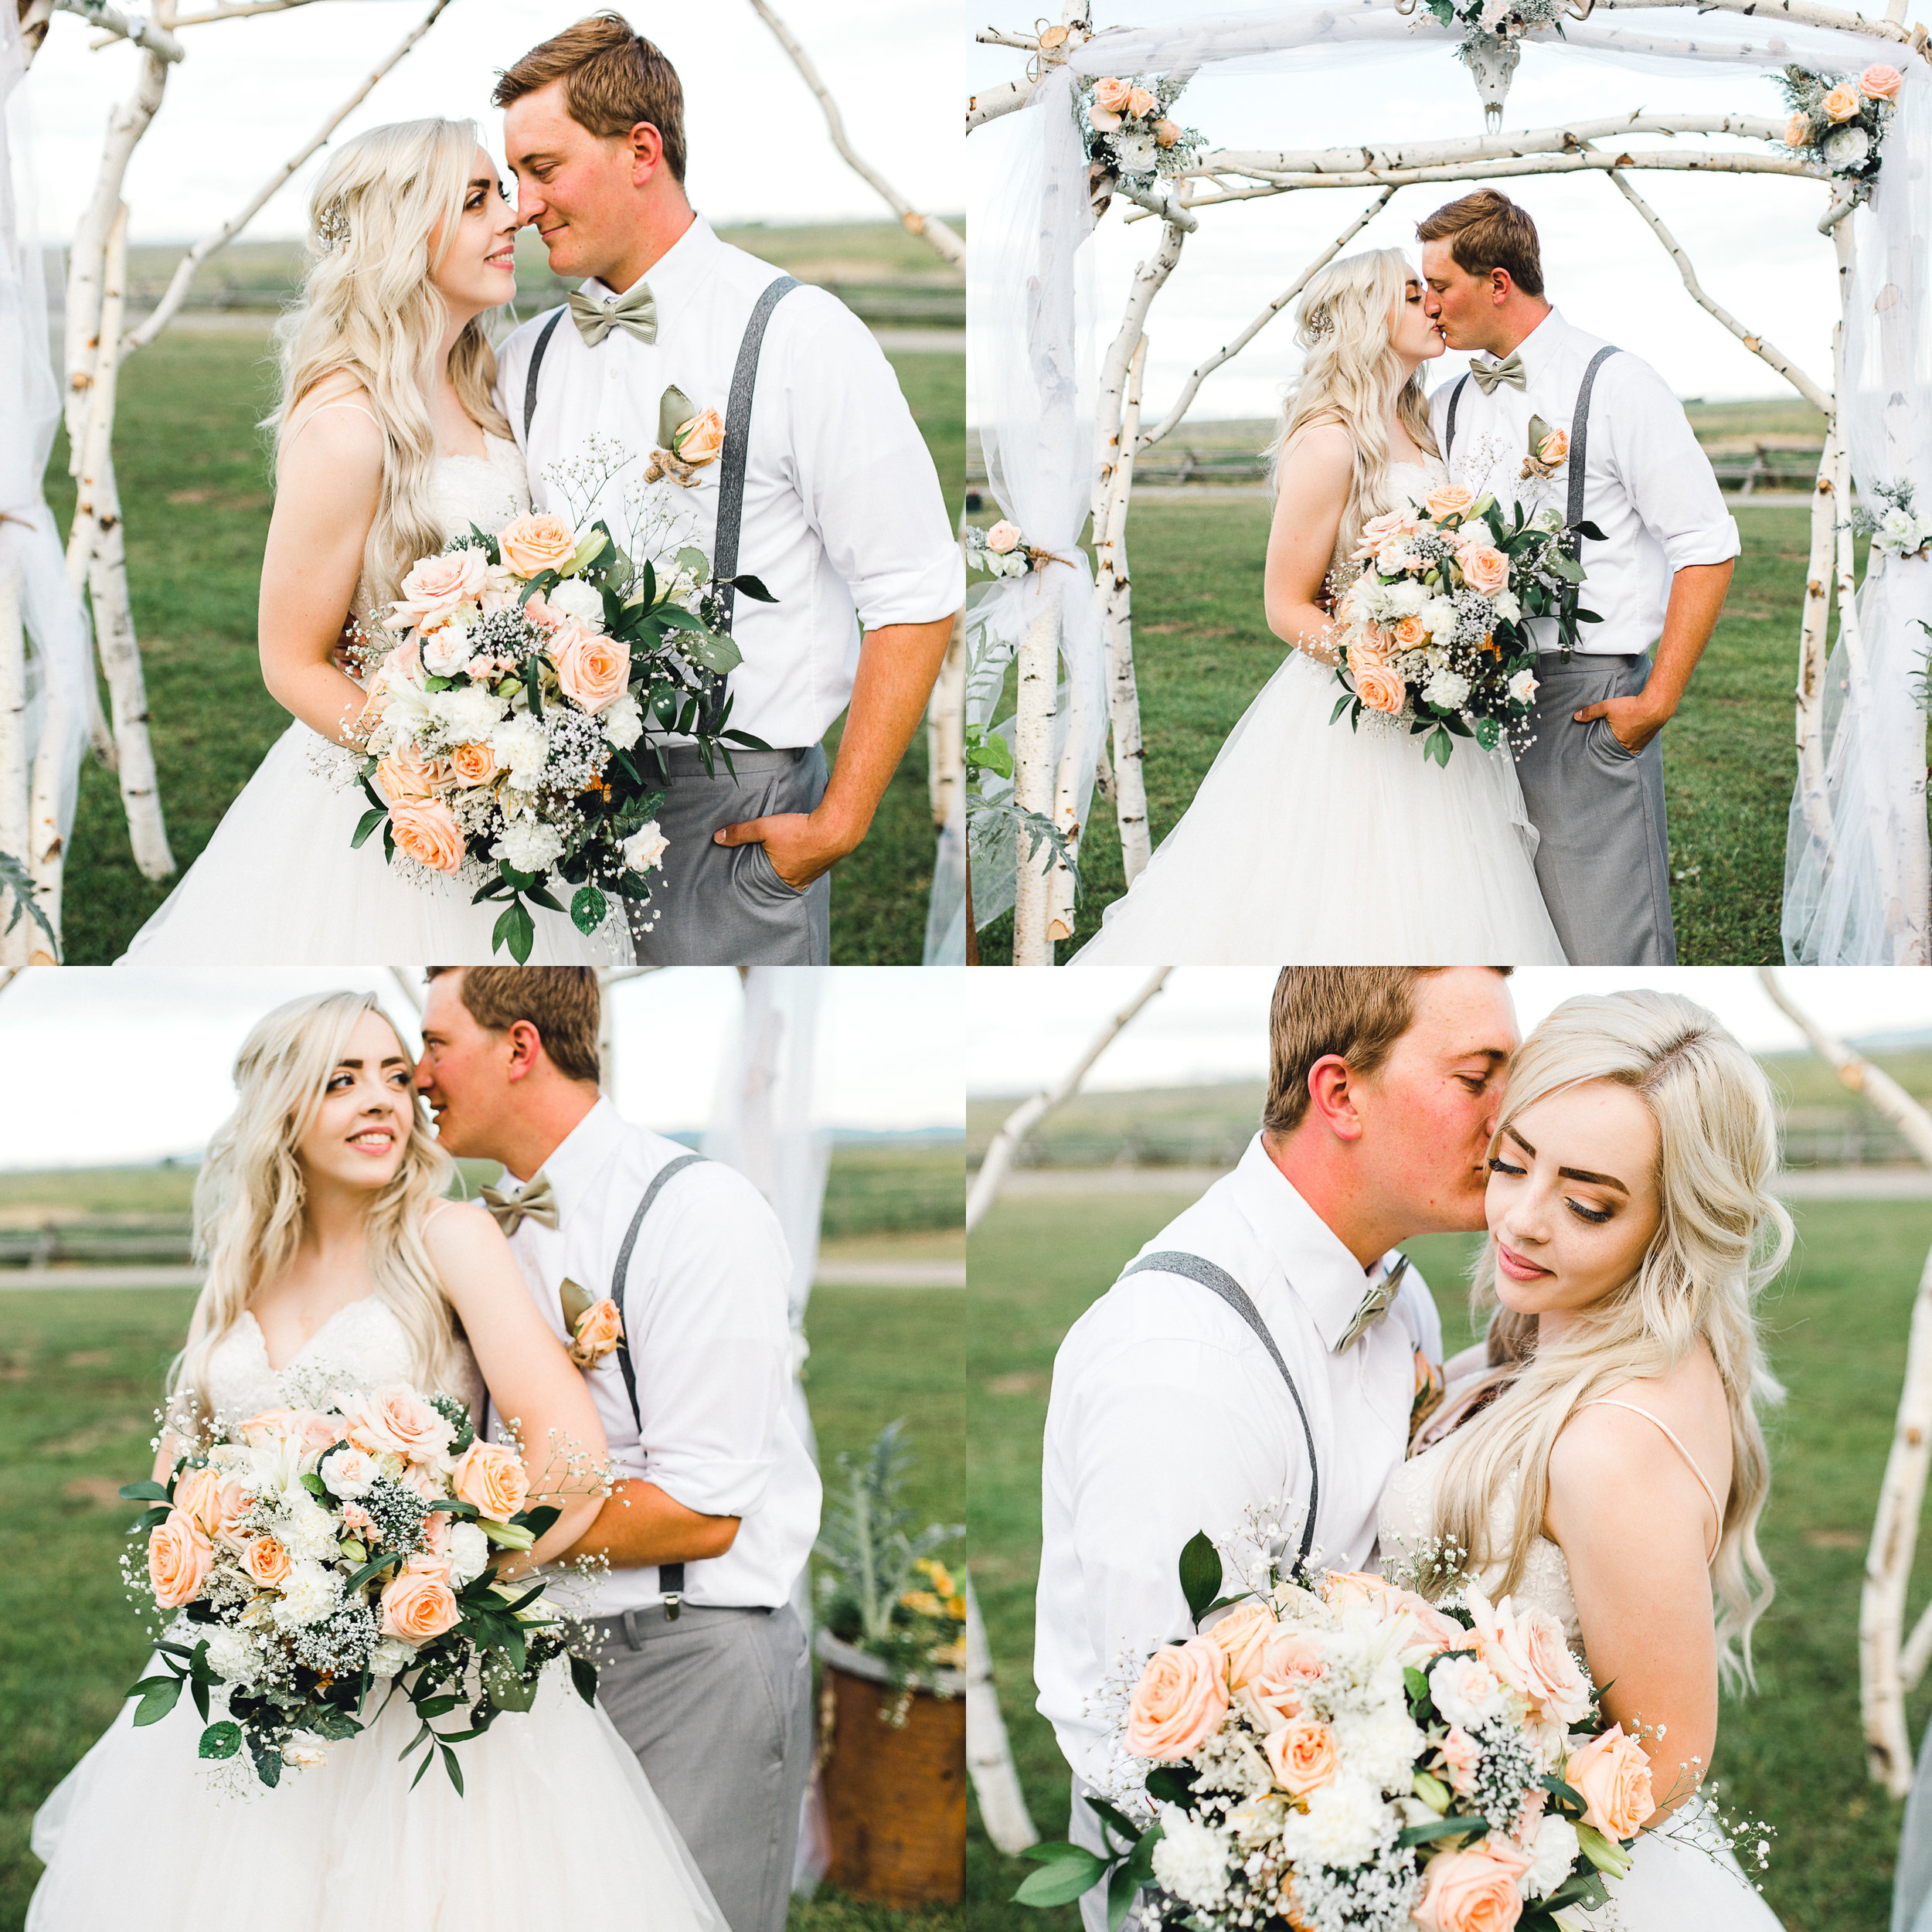 country-outdoor-rustic-wedding-tetons-idaho-anna-christine-photo-24.jpg